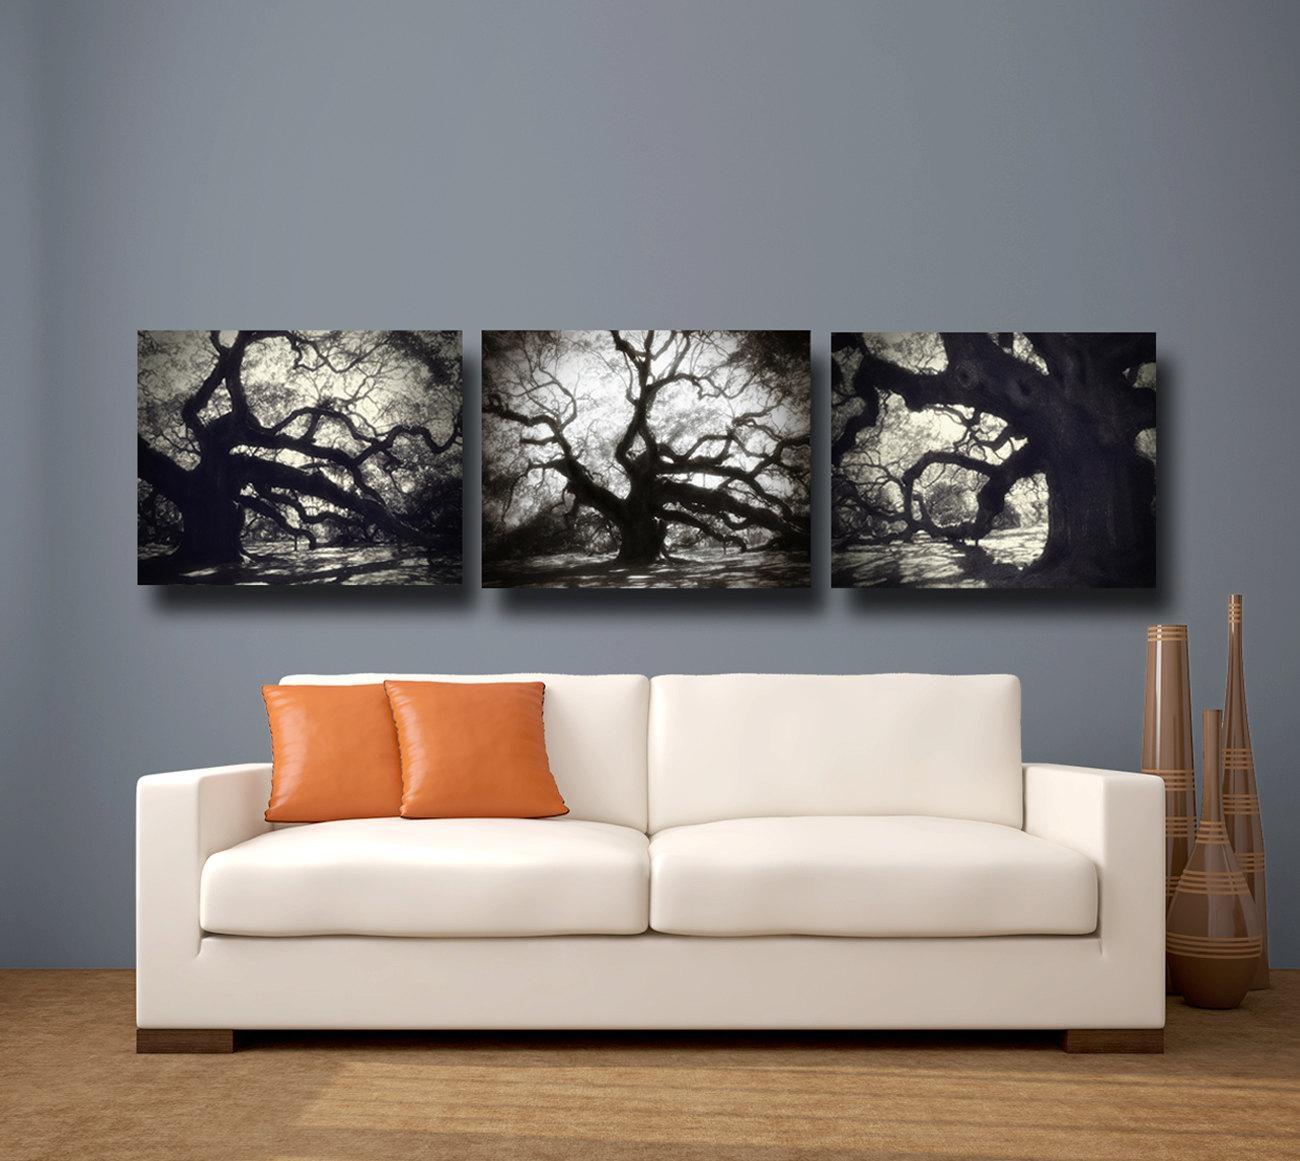 Wall Art Designs: Wall Canvas Art On Demand Free Printable Cheap Inside 3 Set Canvas Wall Art (View 19 of 20)